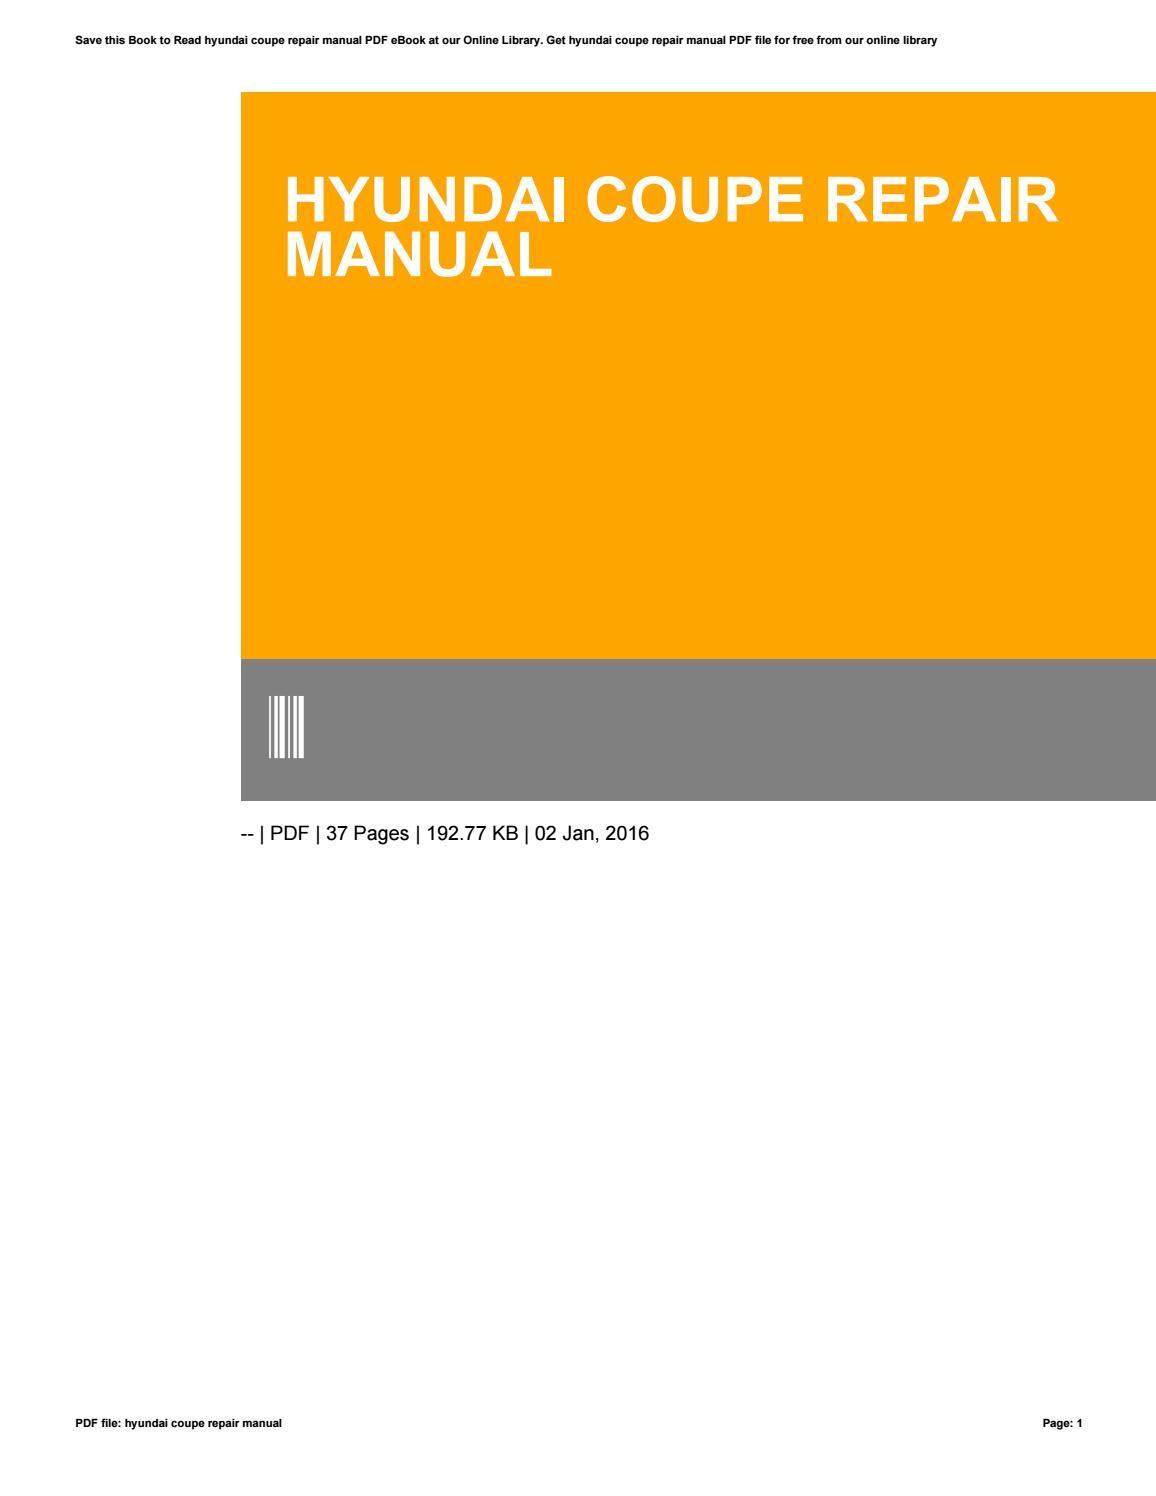 hyundai coupe repair manual by linda43hamidah issuu rh issuu com 2003  Hyundai Tiburon Repair Manual 2003 hyundai tiburon repair manual free  download